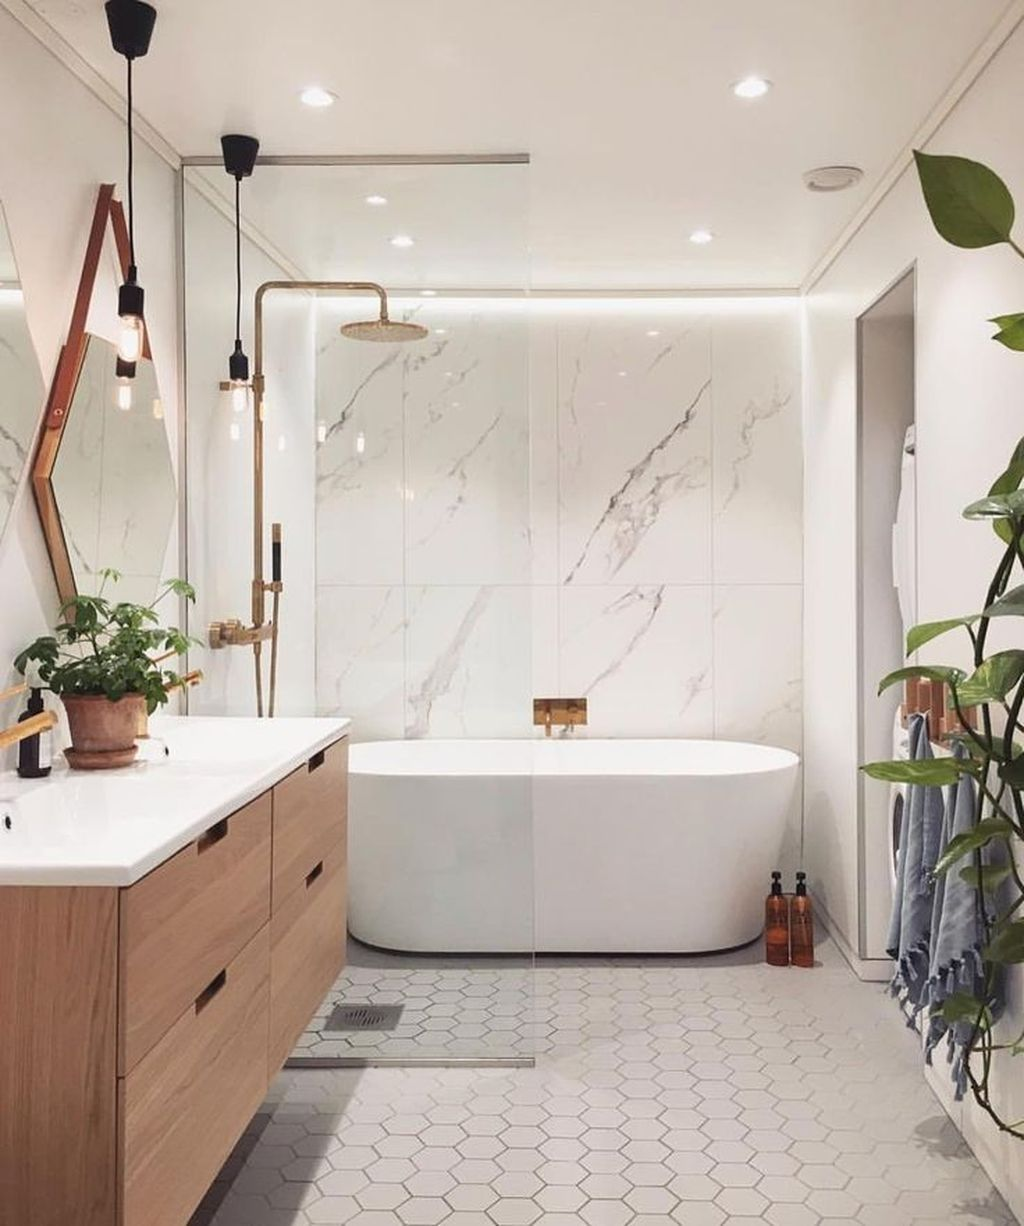 Photo of 30+ Excellent Bathroom Design Ideas You Should Have